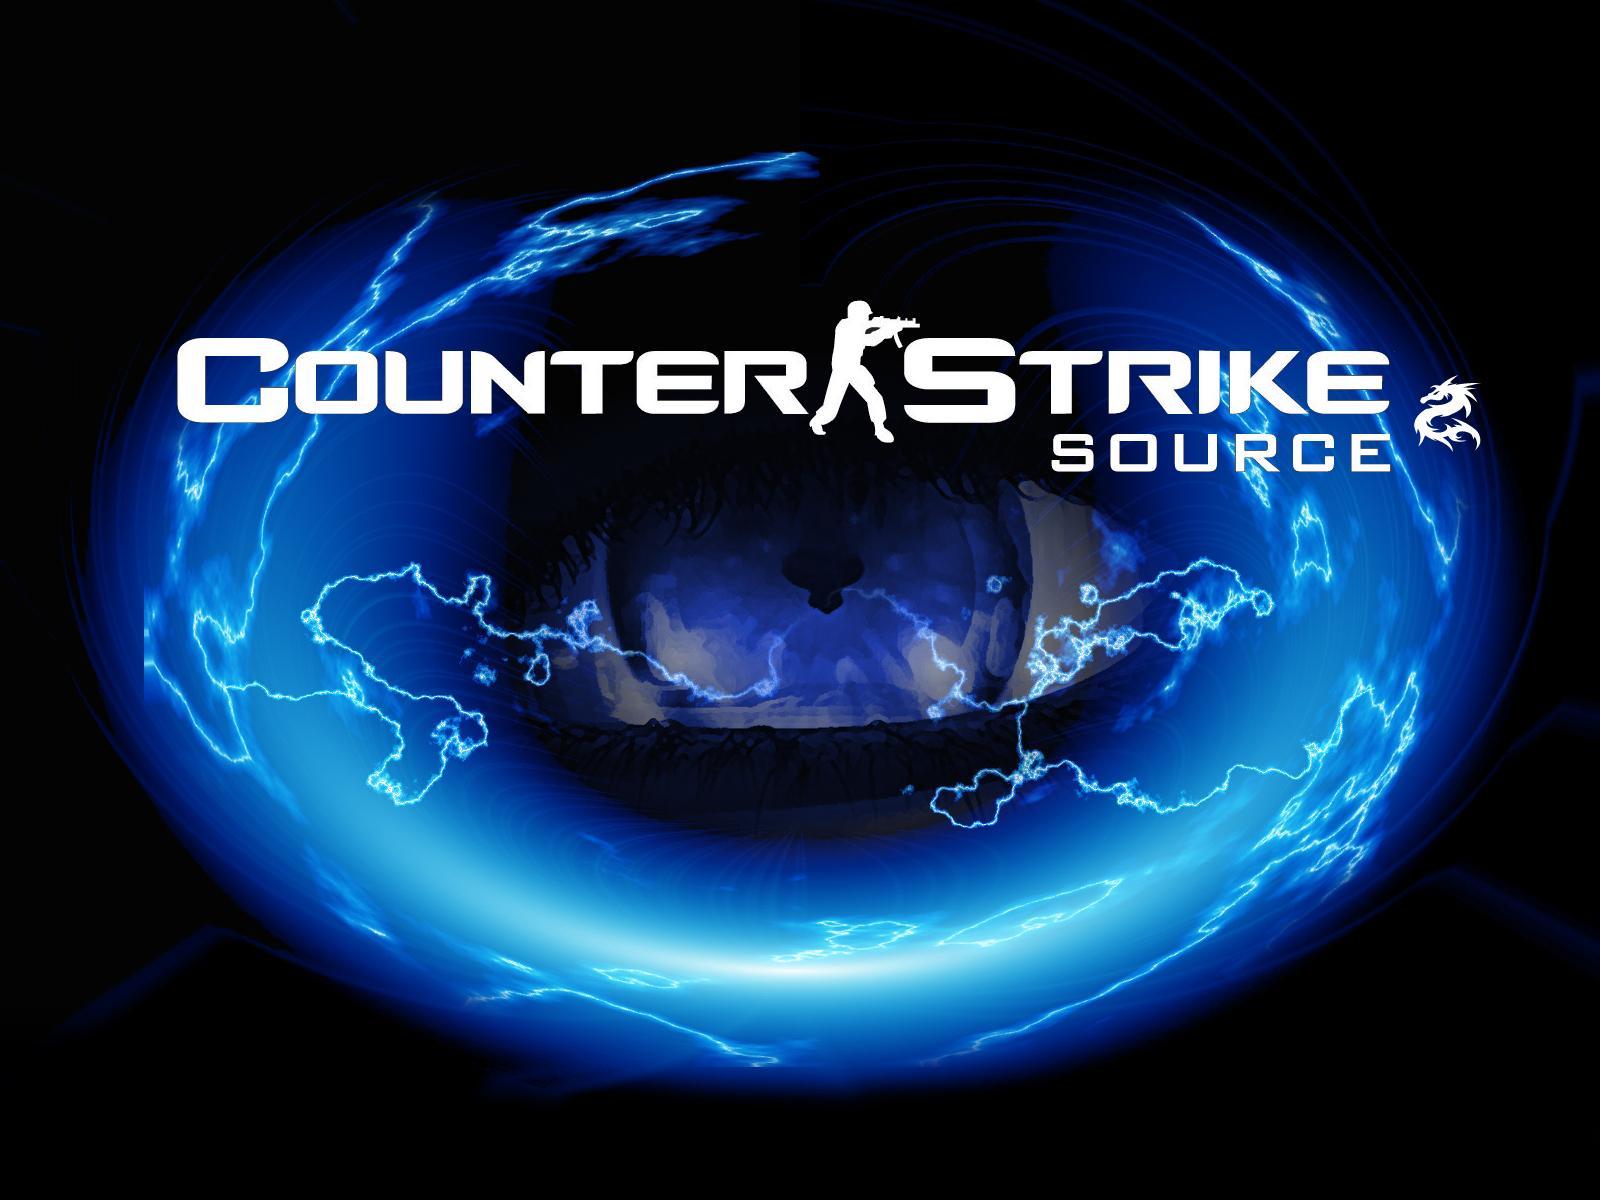 Counter-Strike: Source widescreen